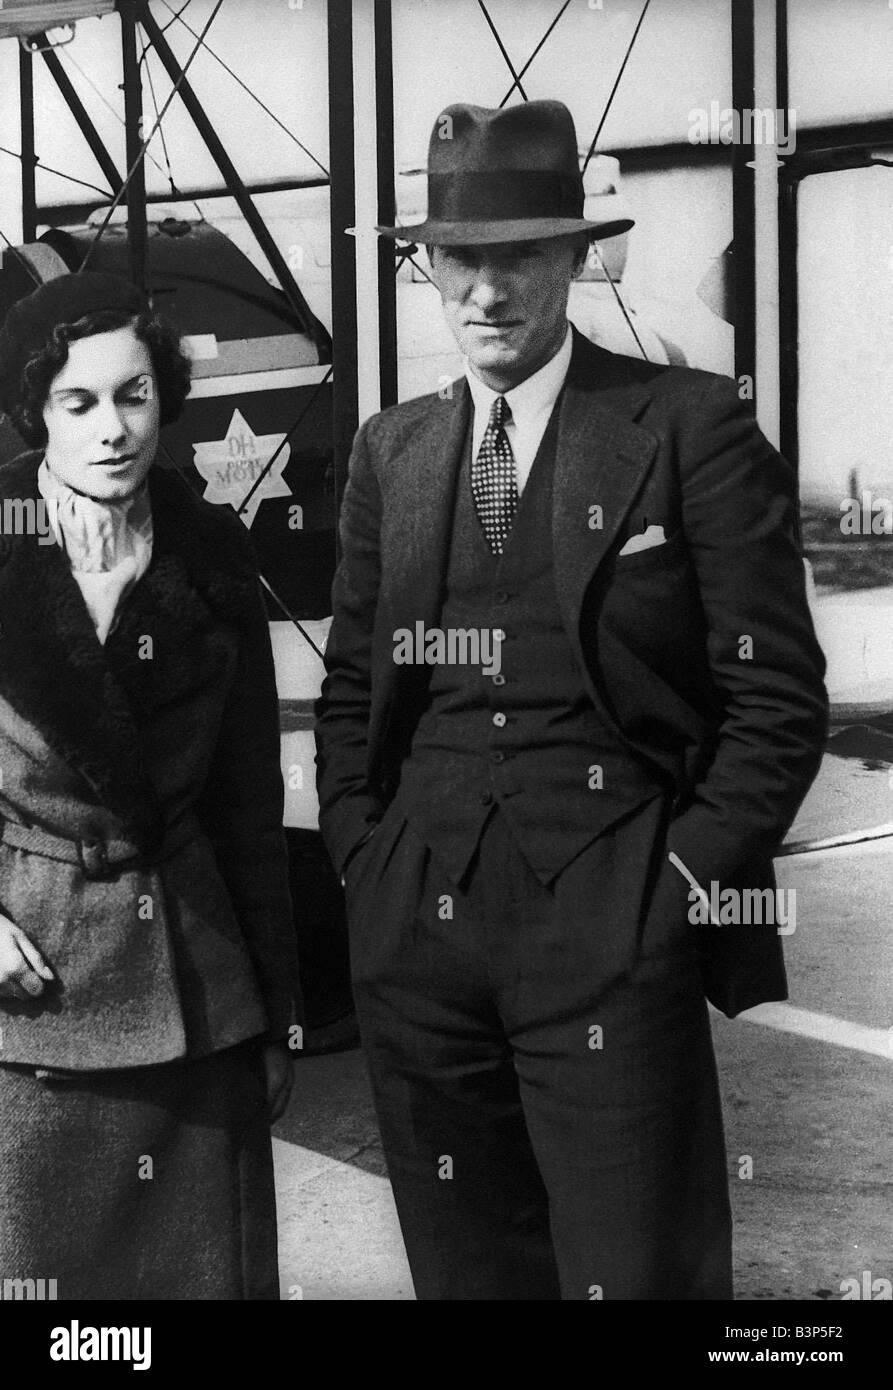 Geoffrey de Havilland Aircraft Designer A young Geoffrey de Havilland posing in front of his plane Born in 1882 - Stock Image